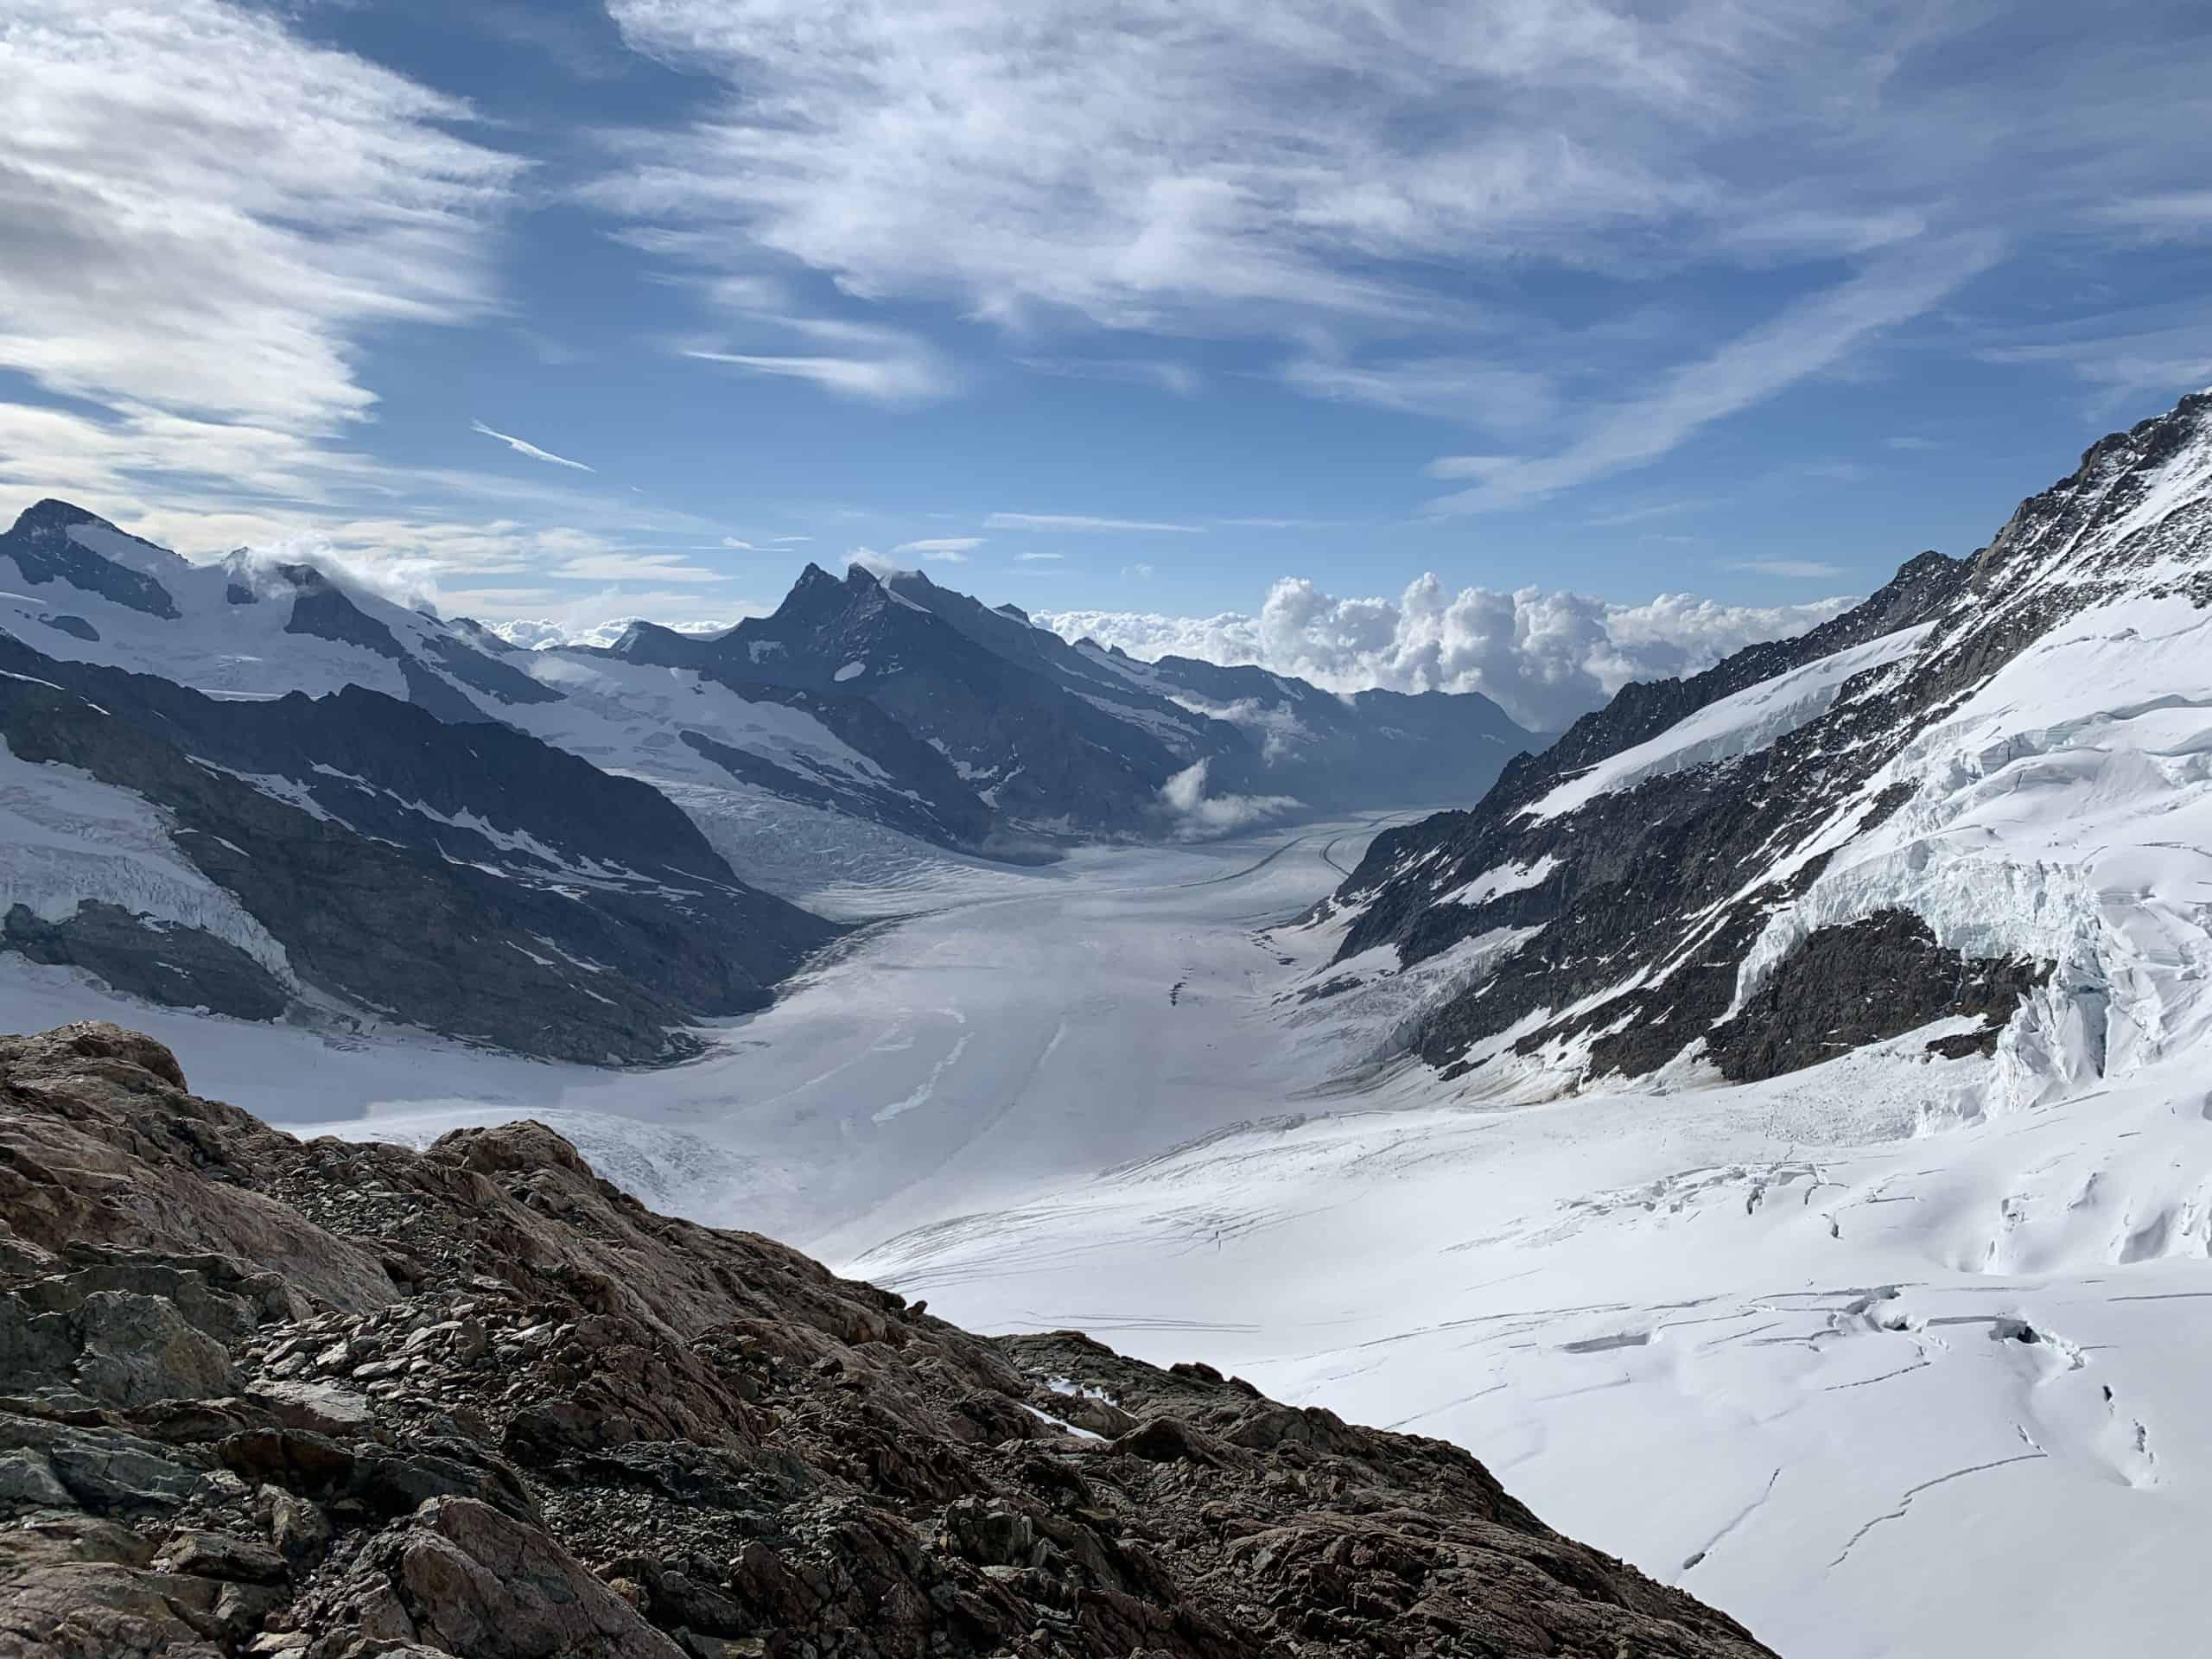 IMG 3863 scaled - Jungfrau - der Star im Berner Oberland